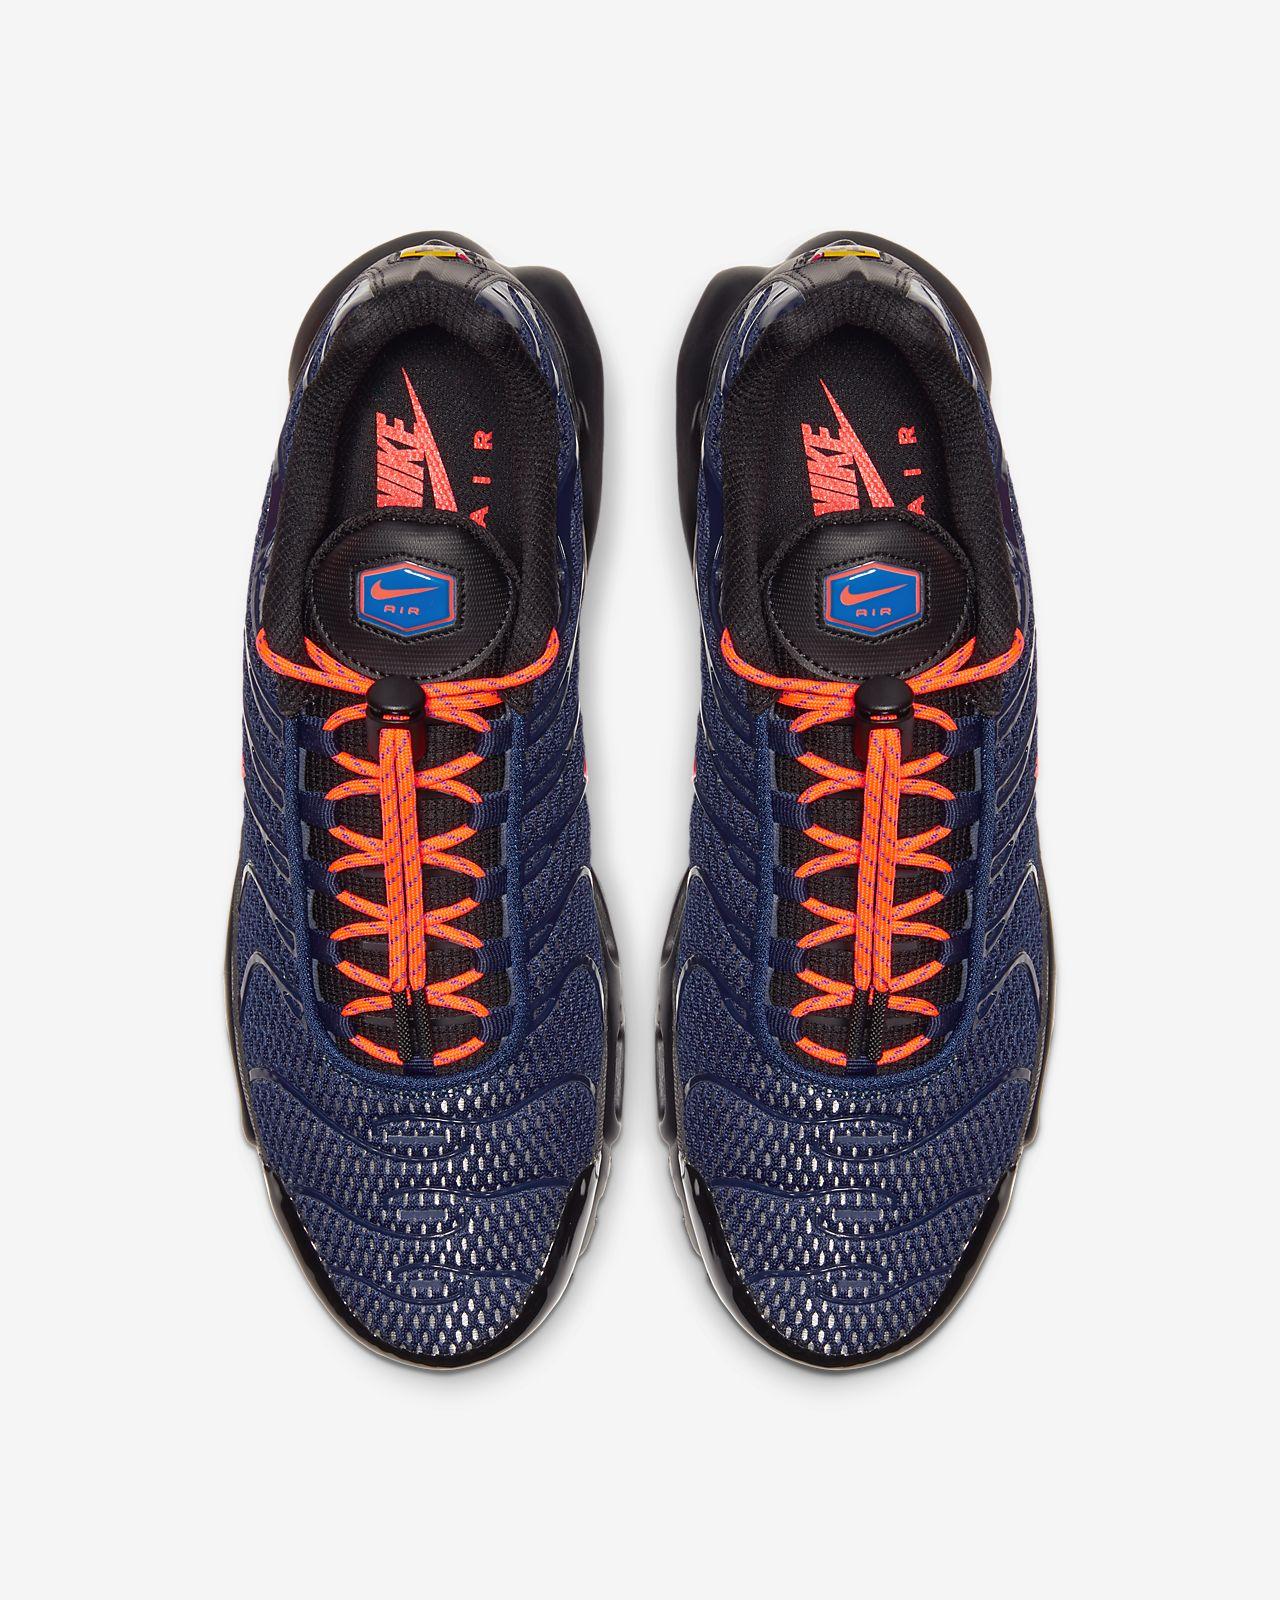 sale retailer 47aa7 7311a Nike Air Max Plus Men's Shoe